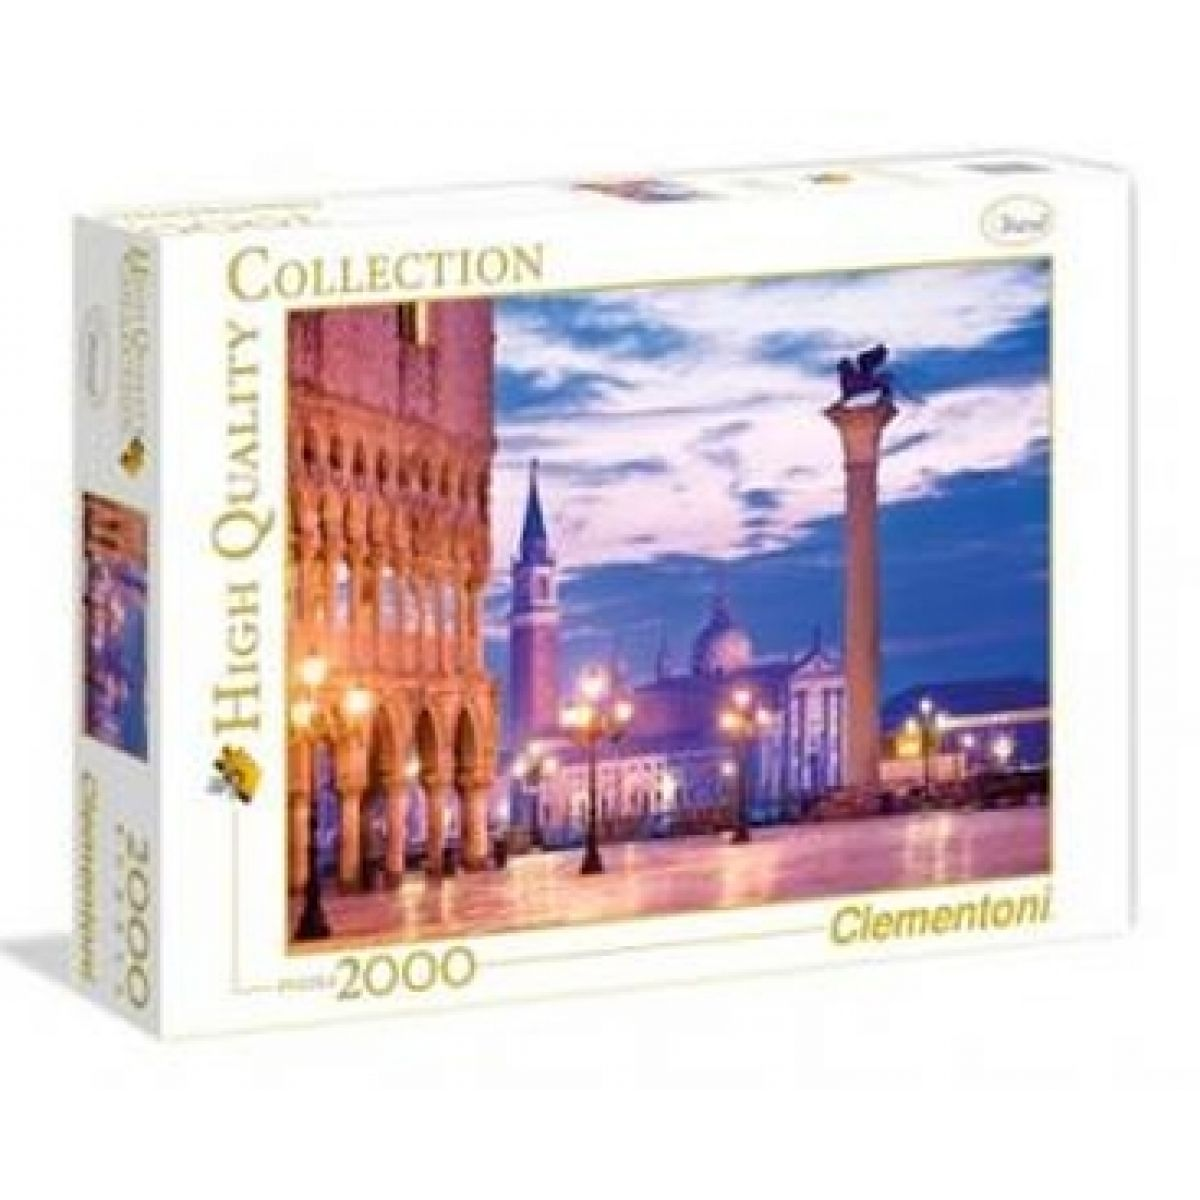 Clementoni Puzzle Benátky 2000d